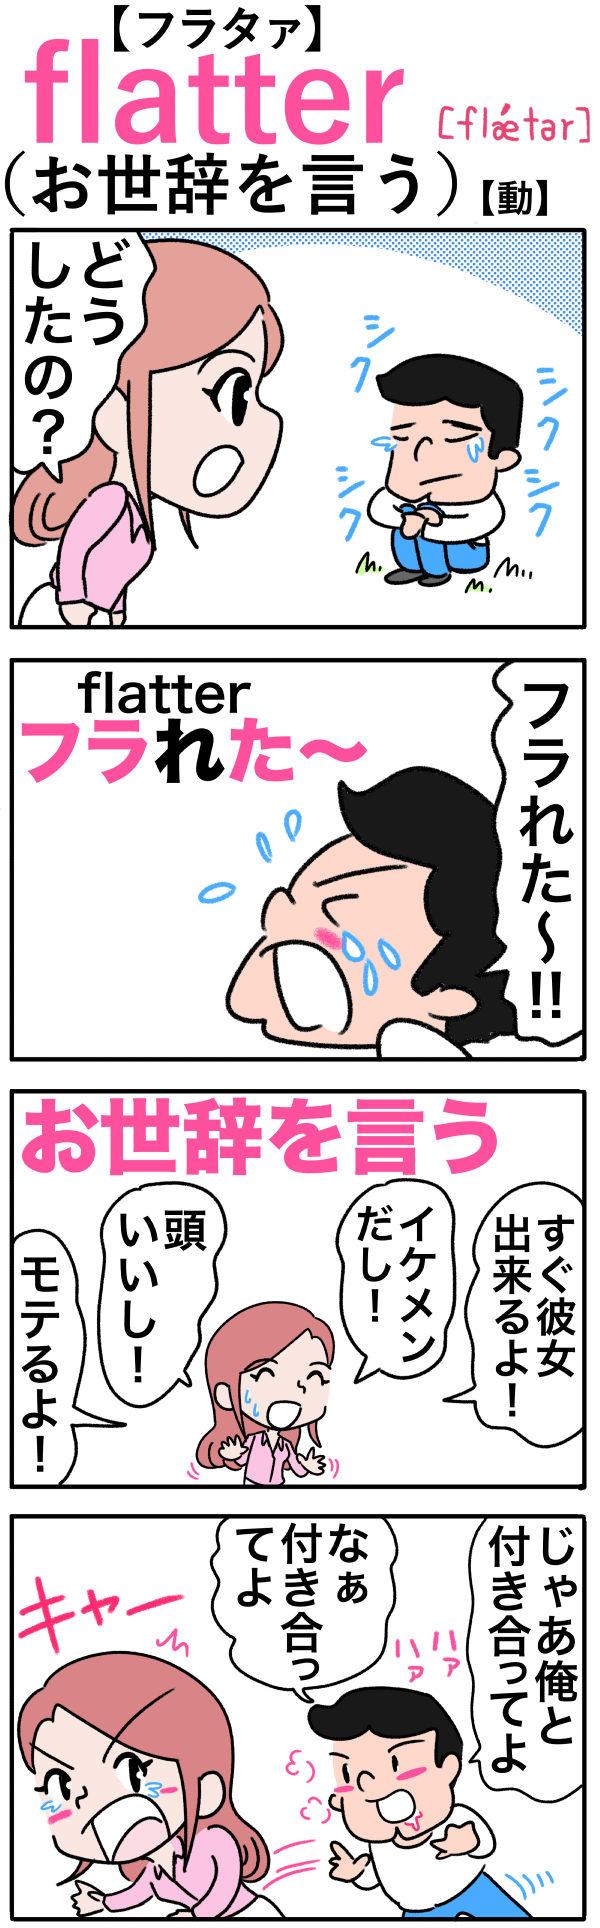 flatter(お世辞を言う)の語呂合わせ英単語